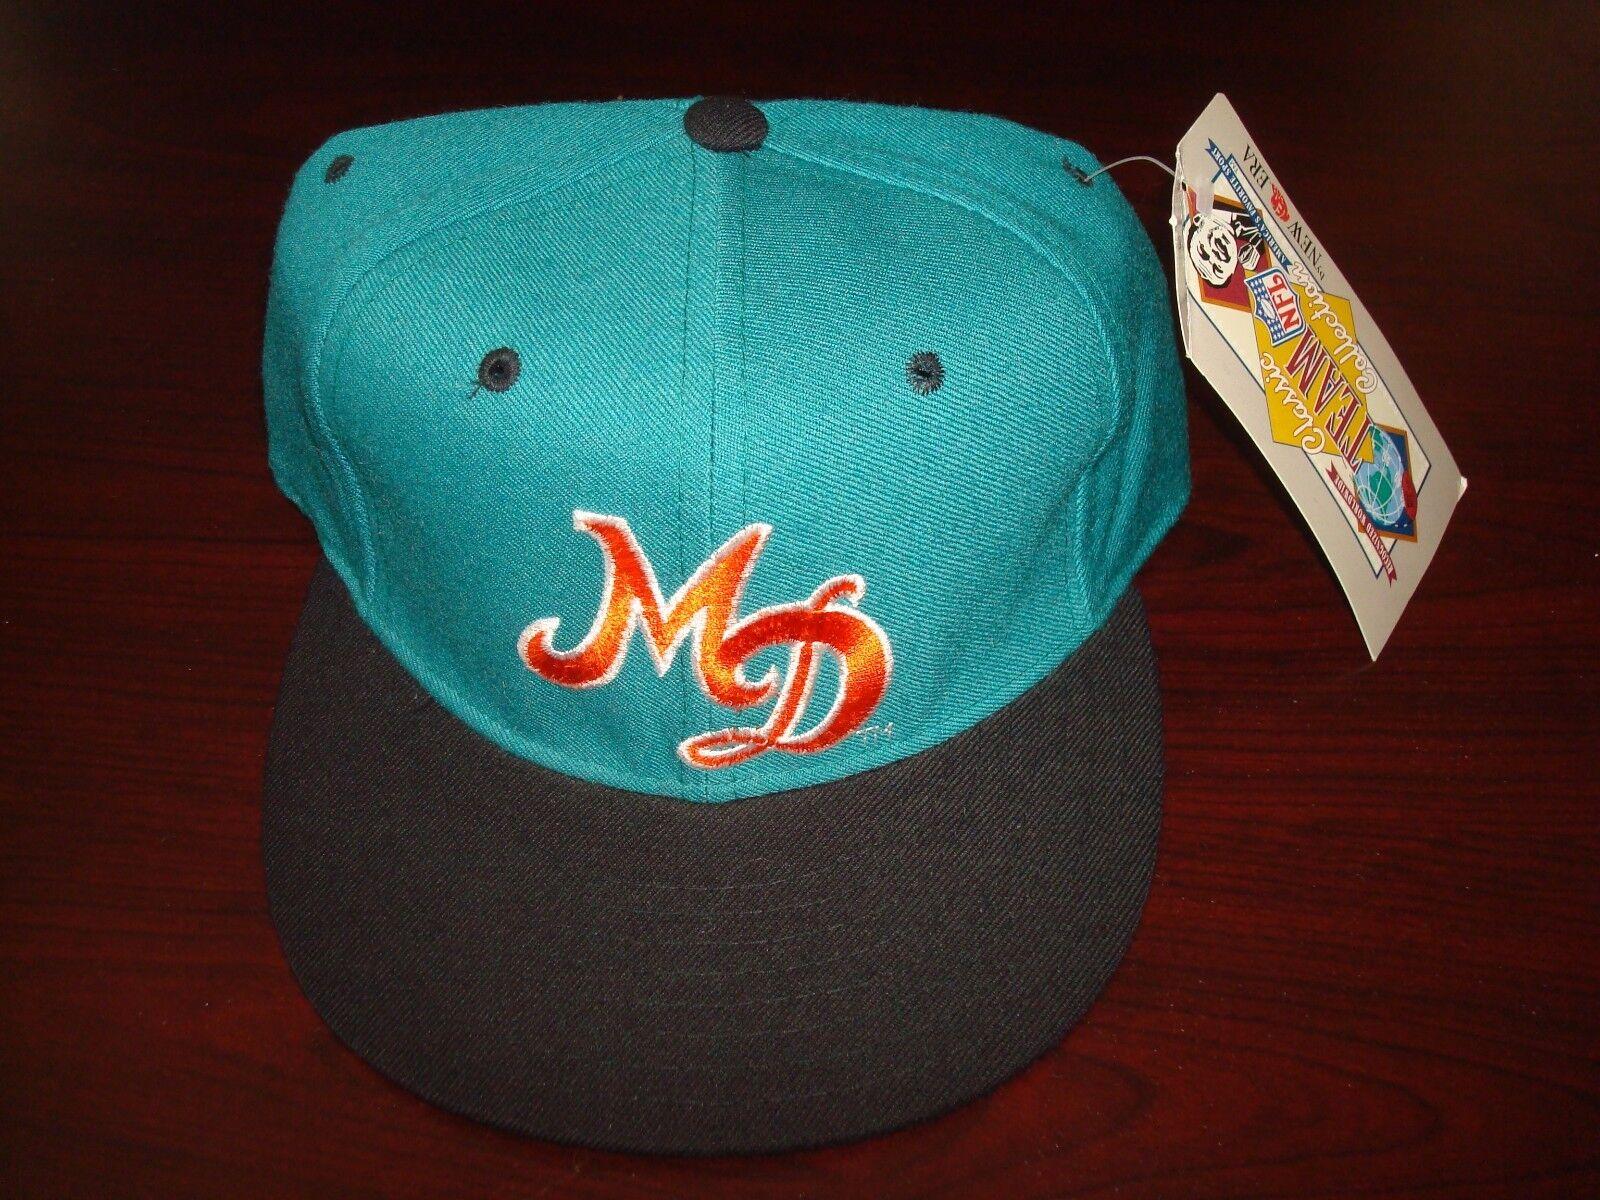 MIAMI NFL DOLPHINS MF MARINO TEAM NFL MIAMI NEW ERA FITTED SZ 7 3/8  1990S VINTAGE HAT CAP 5709d6